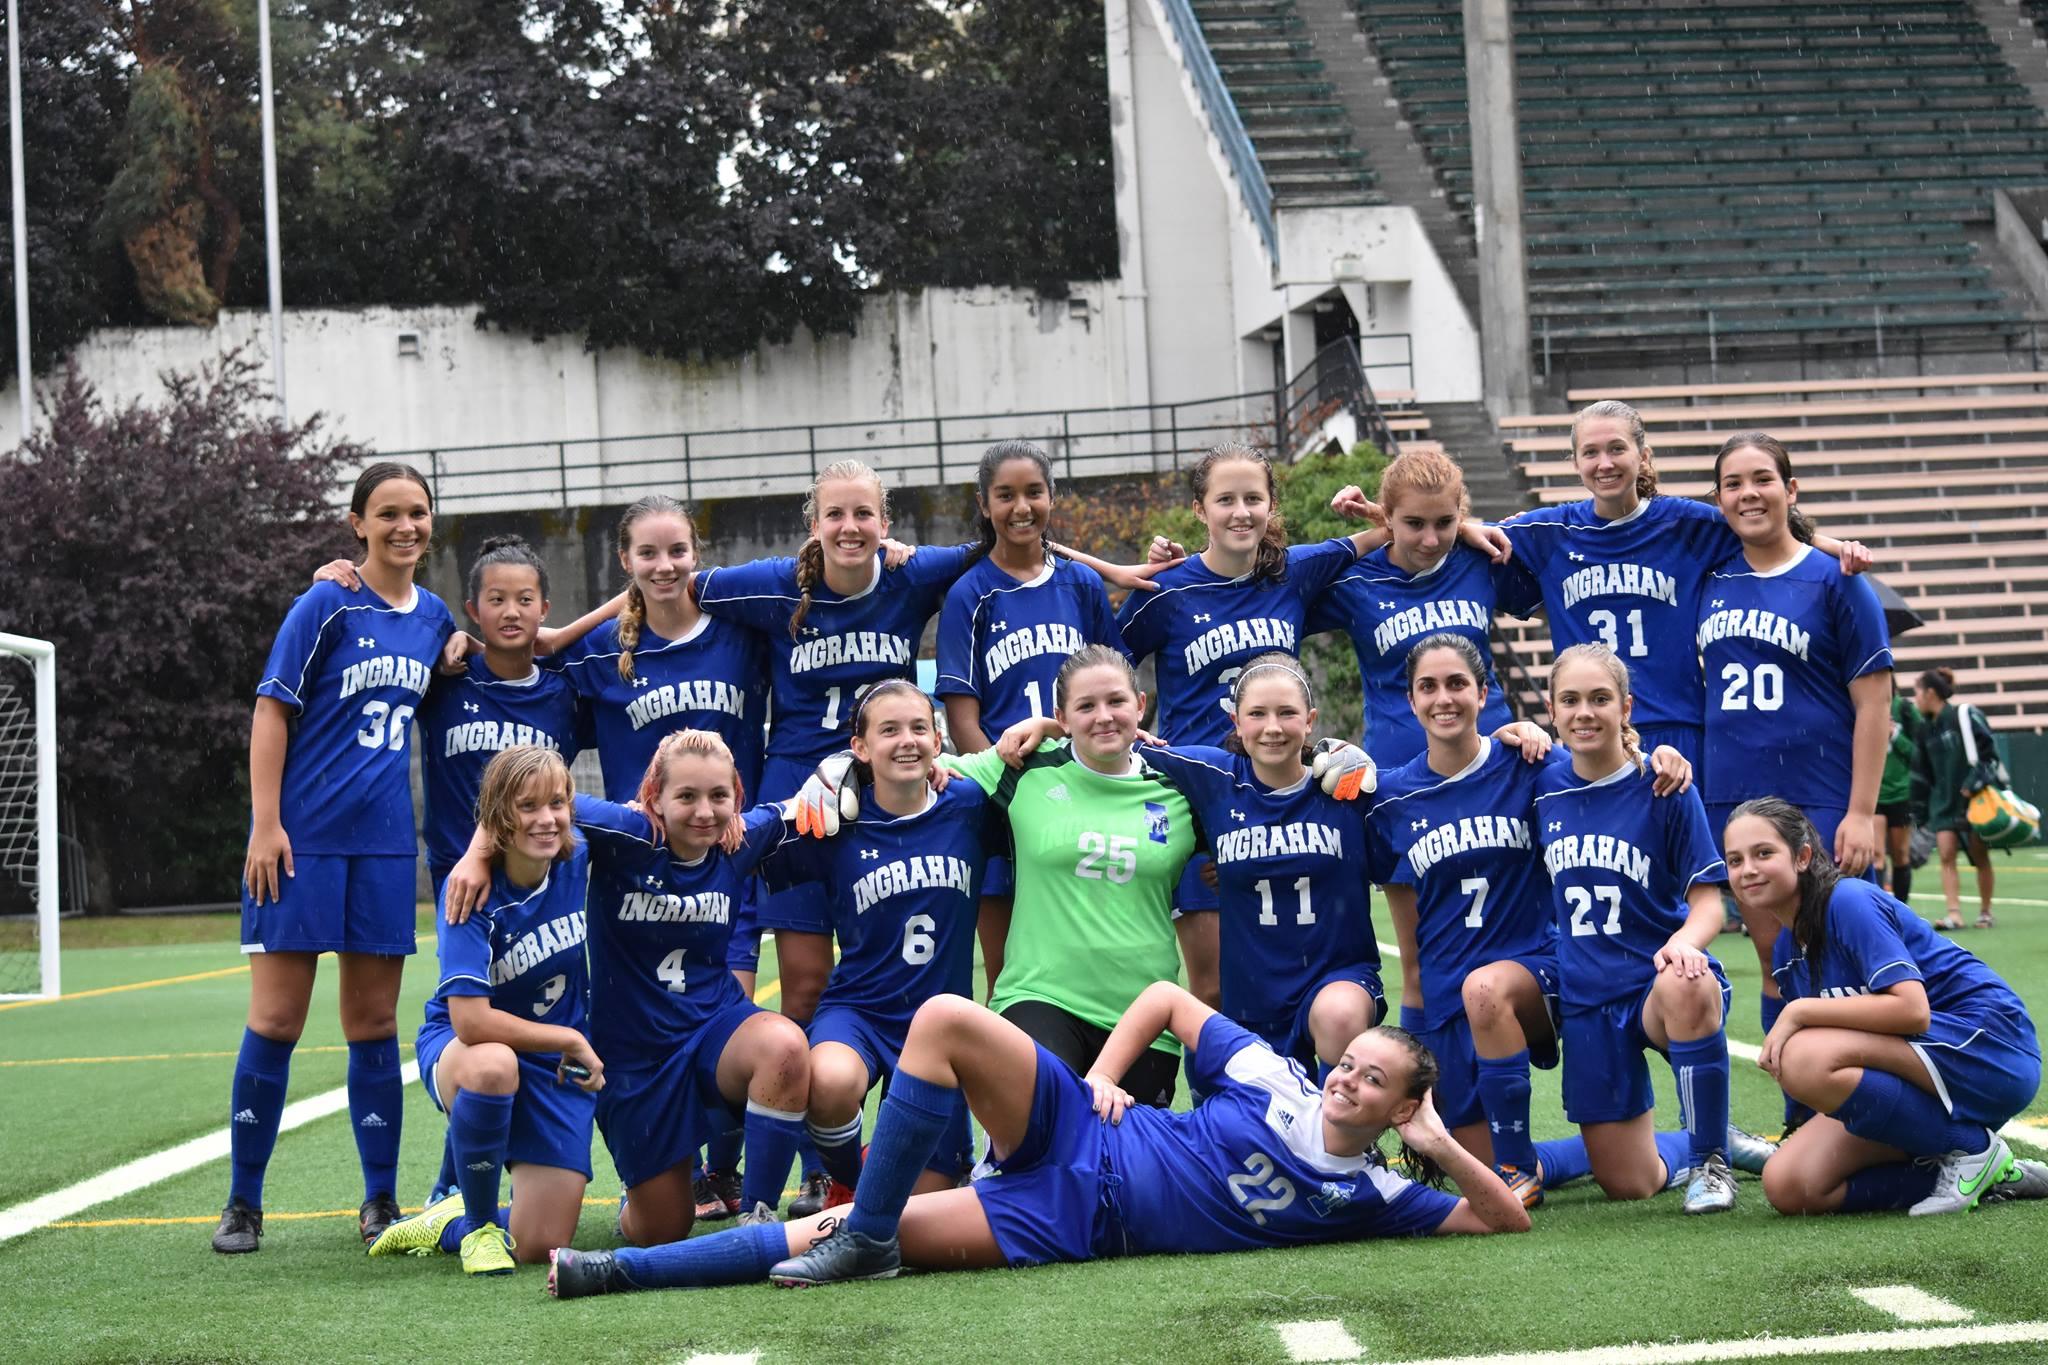 2015 Girls JV Team